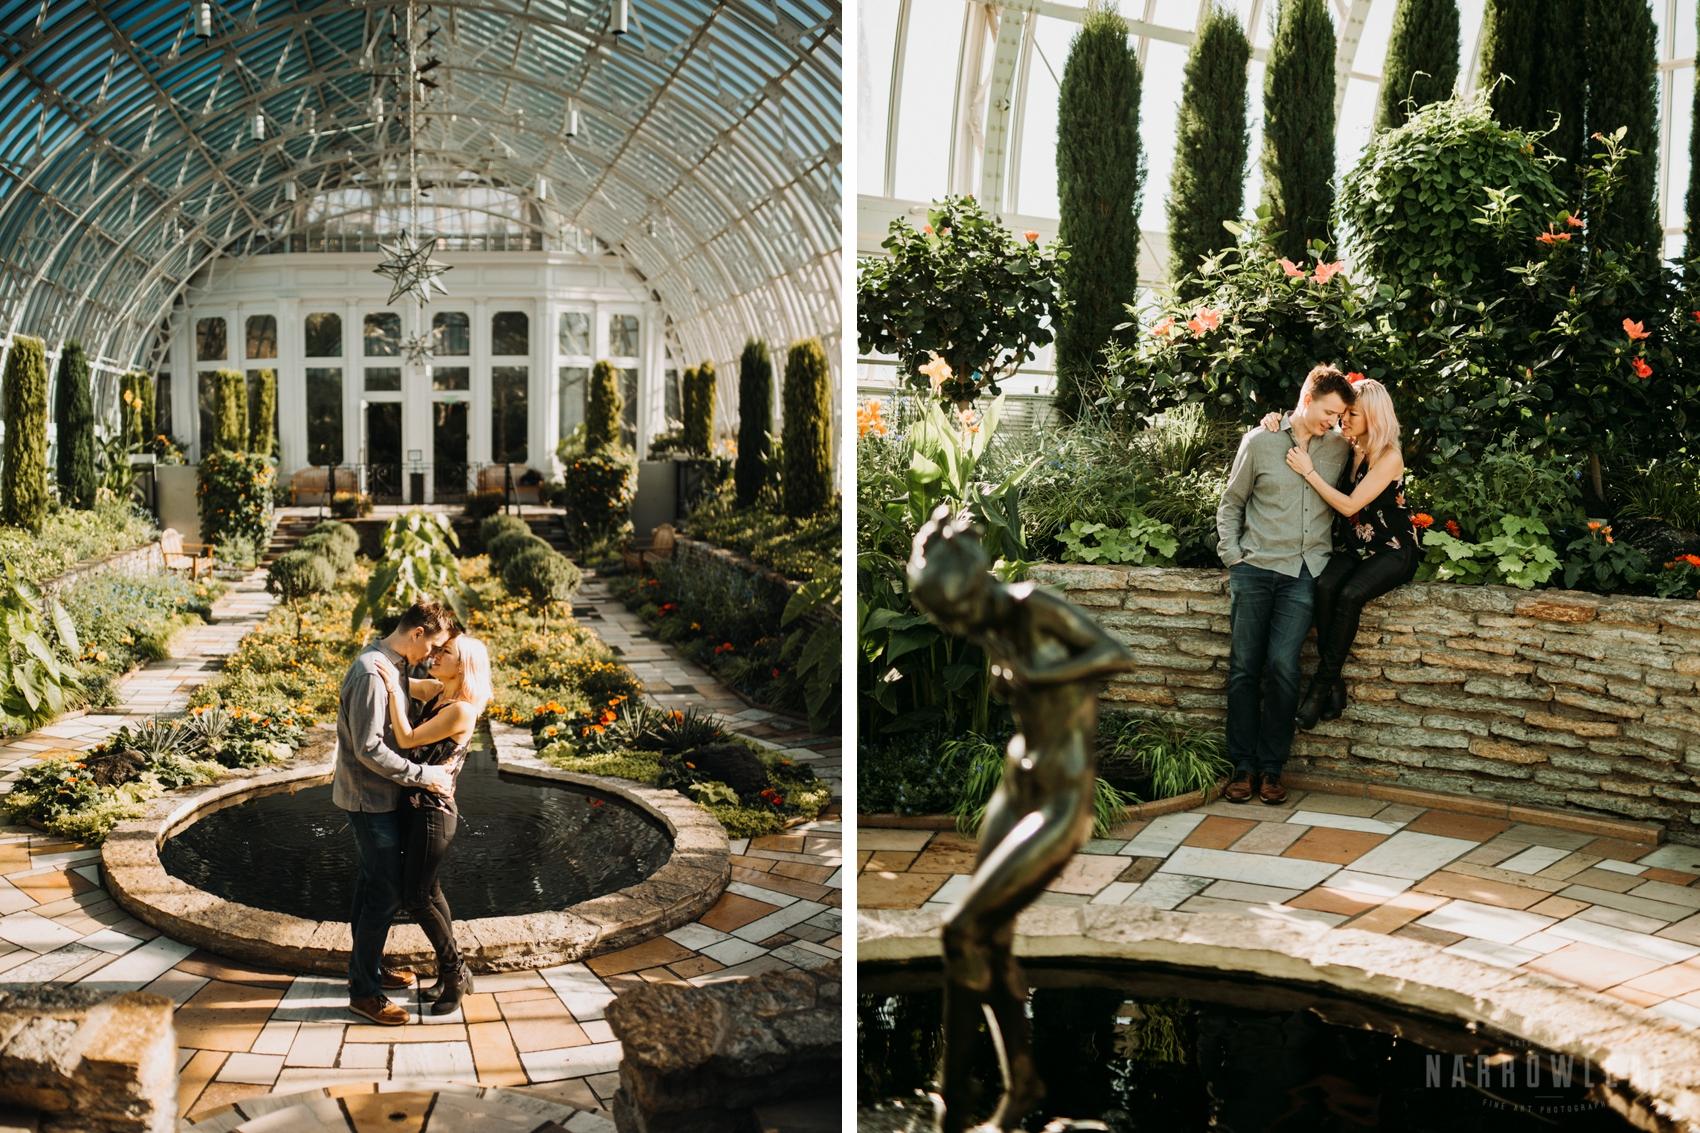 garden-engagement-at-como-park-conservatory-st-paul-mn-011-012.jpg